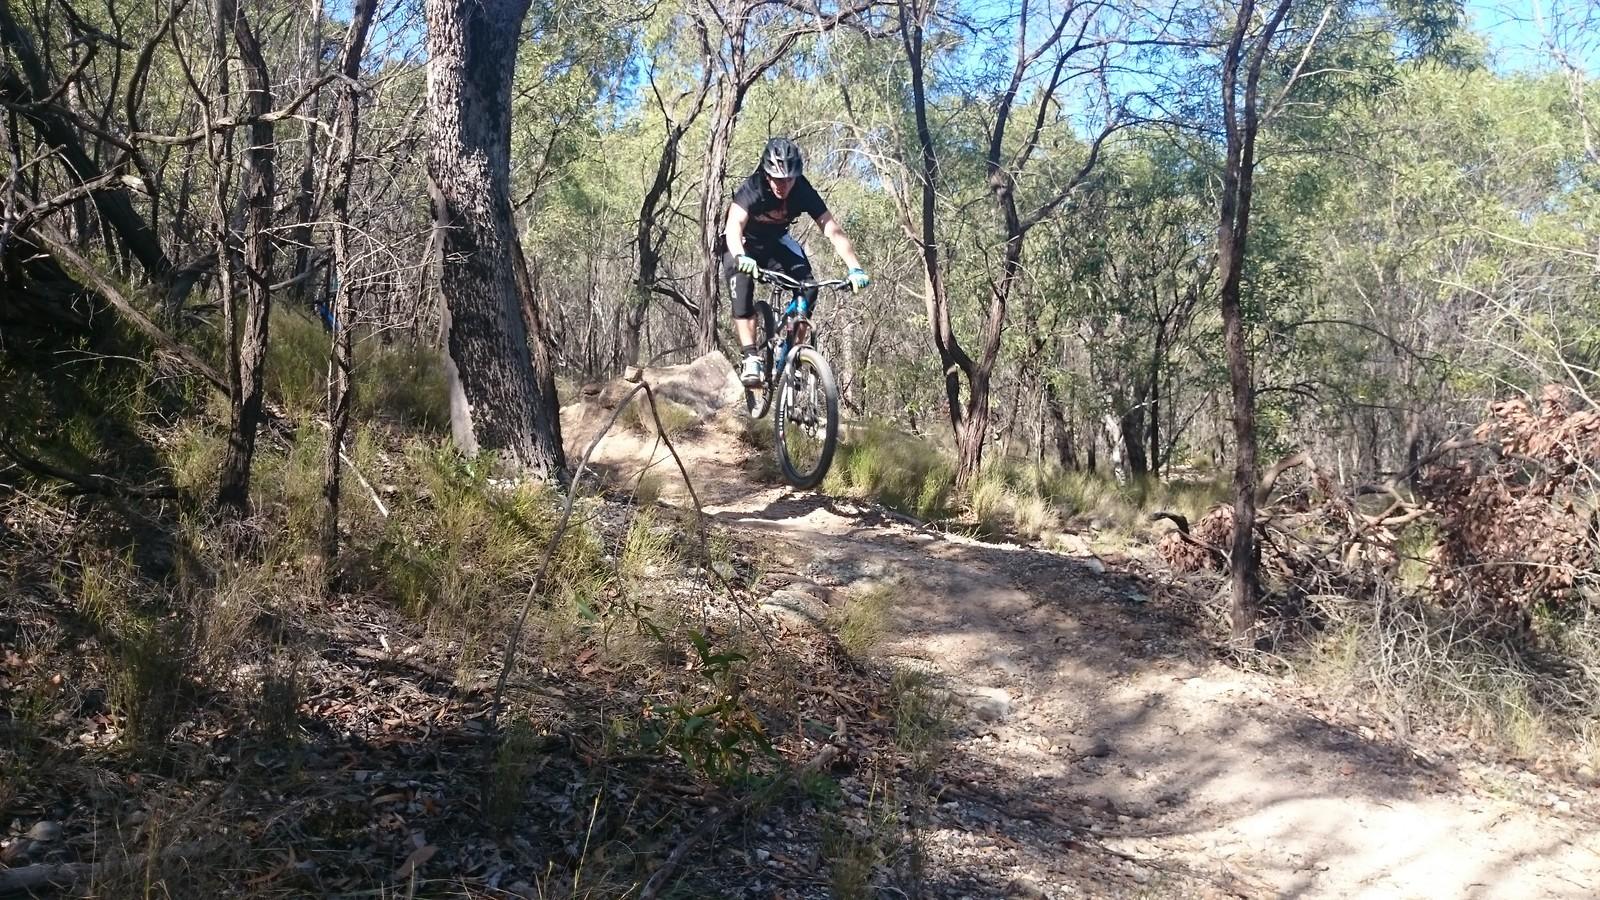 Trail days - BoostinSimmo - Mountain Biking Pictures - Vital MTB